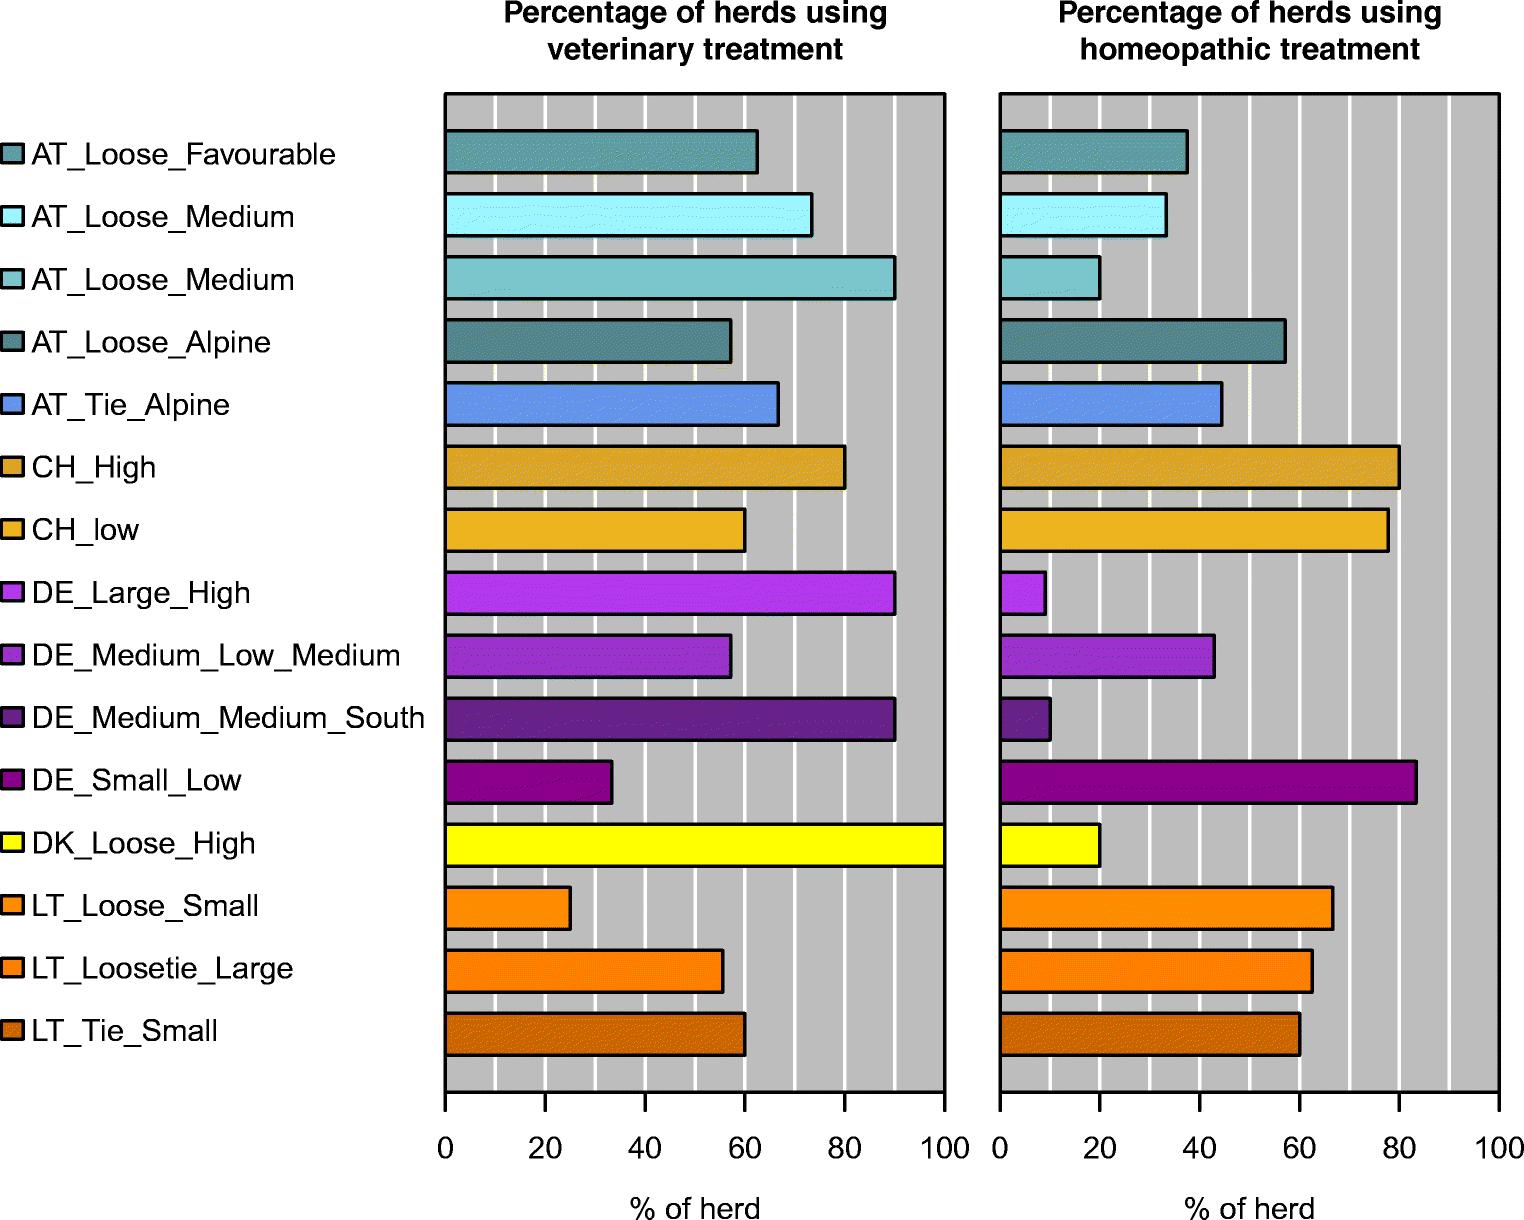 Characteristics of organic dairy major farm types in seven European